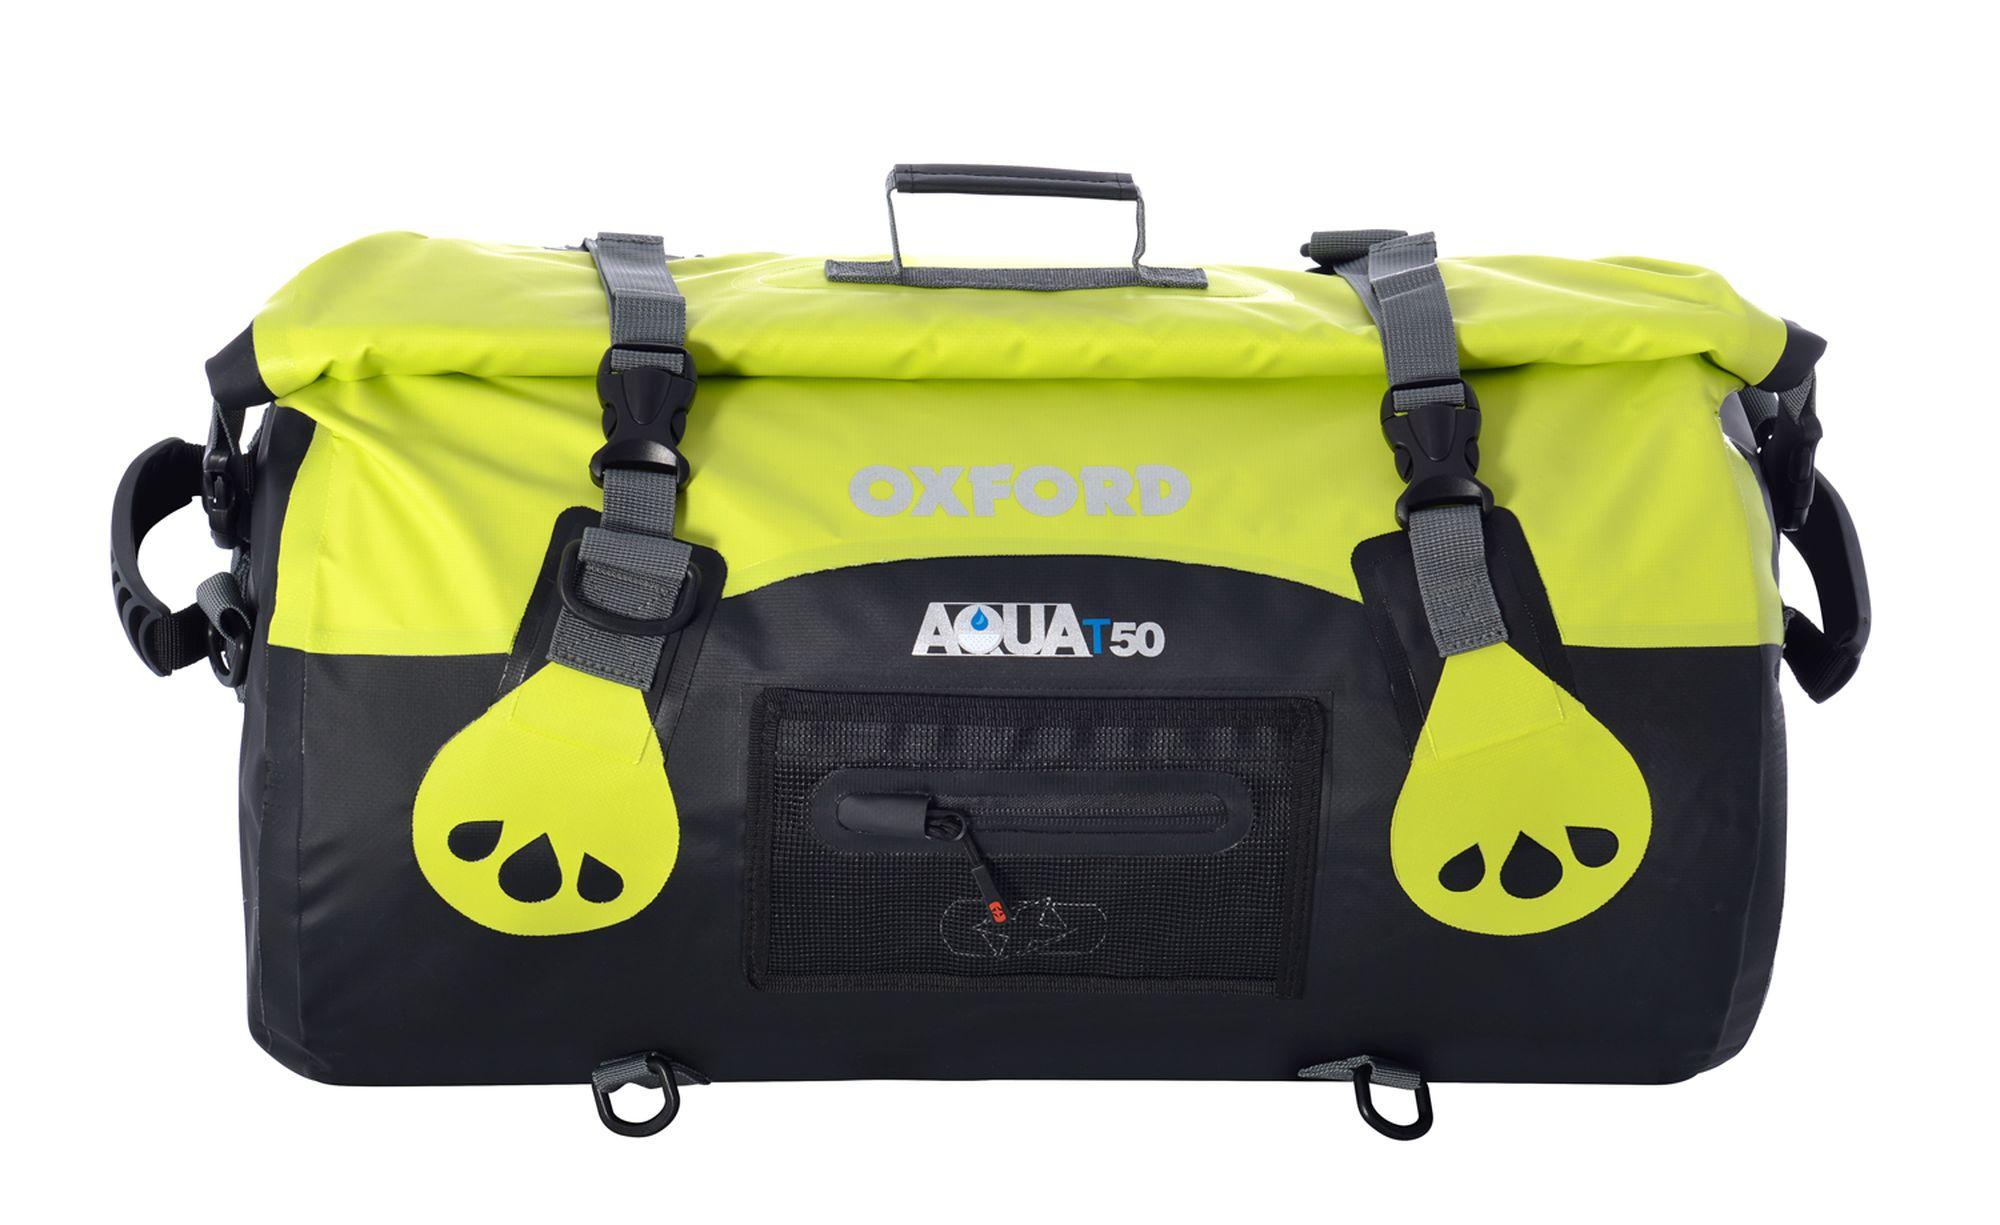 Vodotěsný vak Oxford Aqua50 Roll Bag černo-fluo žlutý